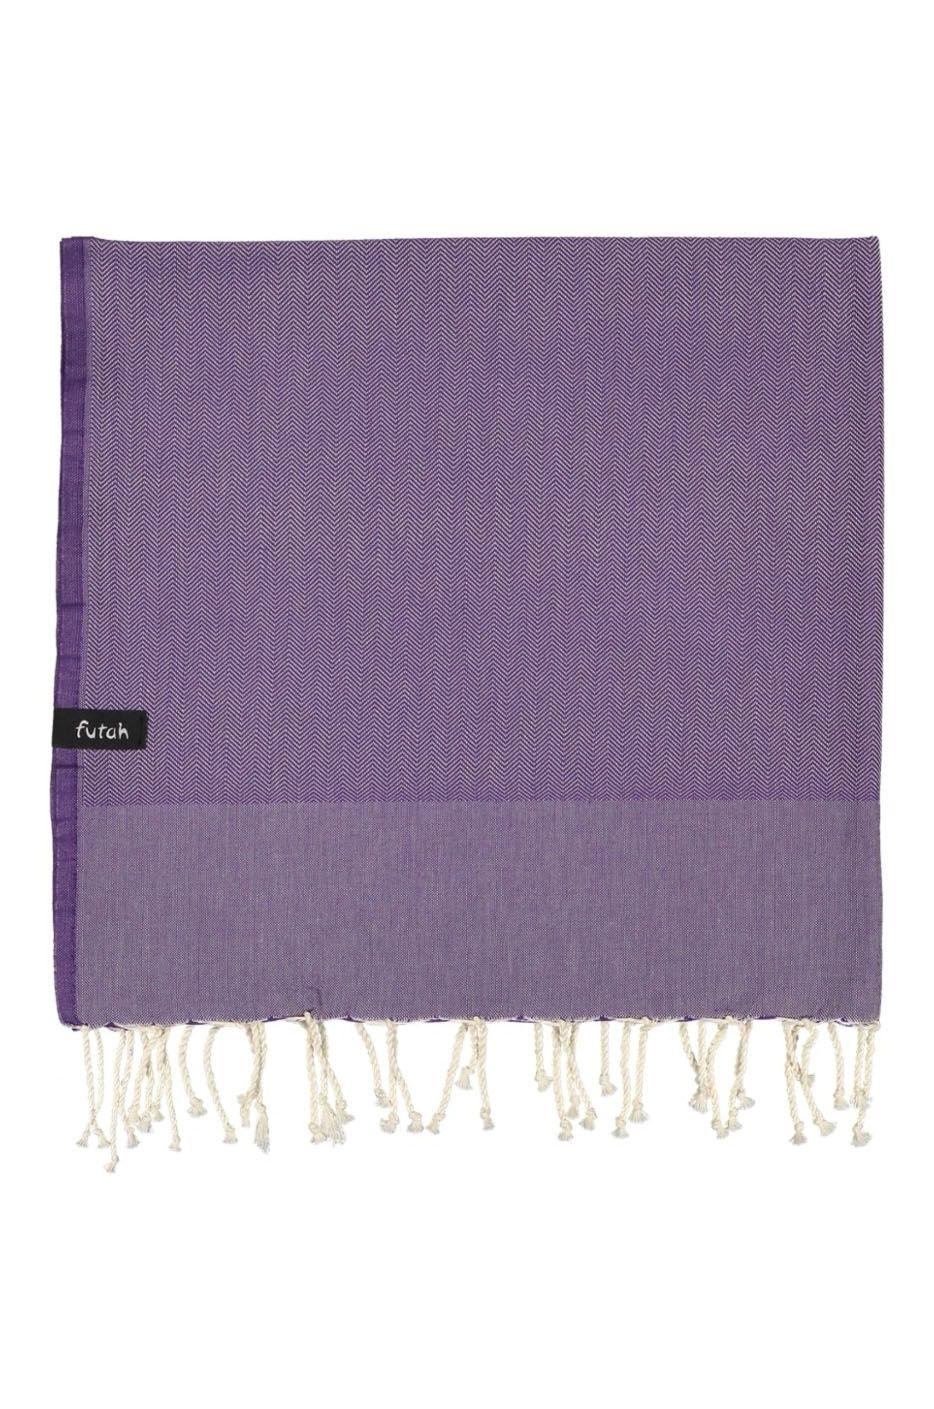 Toalha Futah ERICEIRA Purple